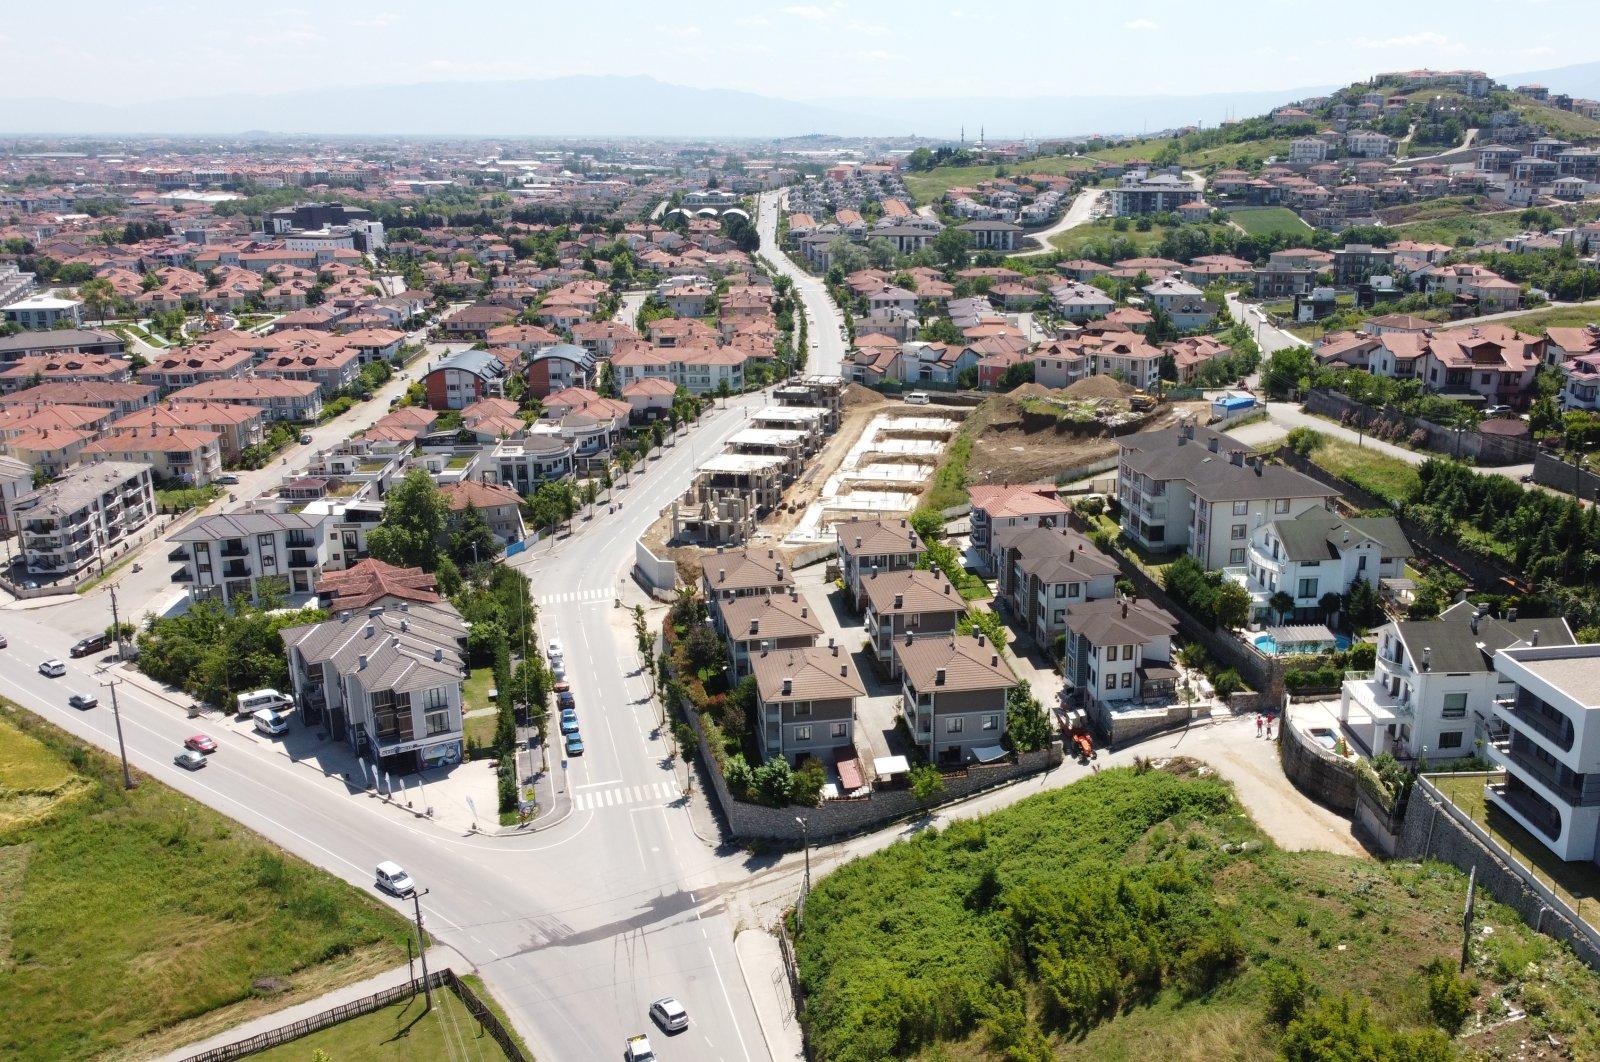 An overview of a neighborhood in northwestern Sakarya province in Turkey, June 6, 2020. (AA Photo)